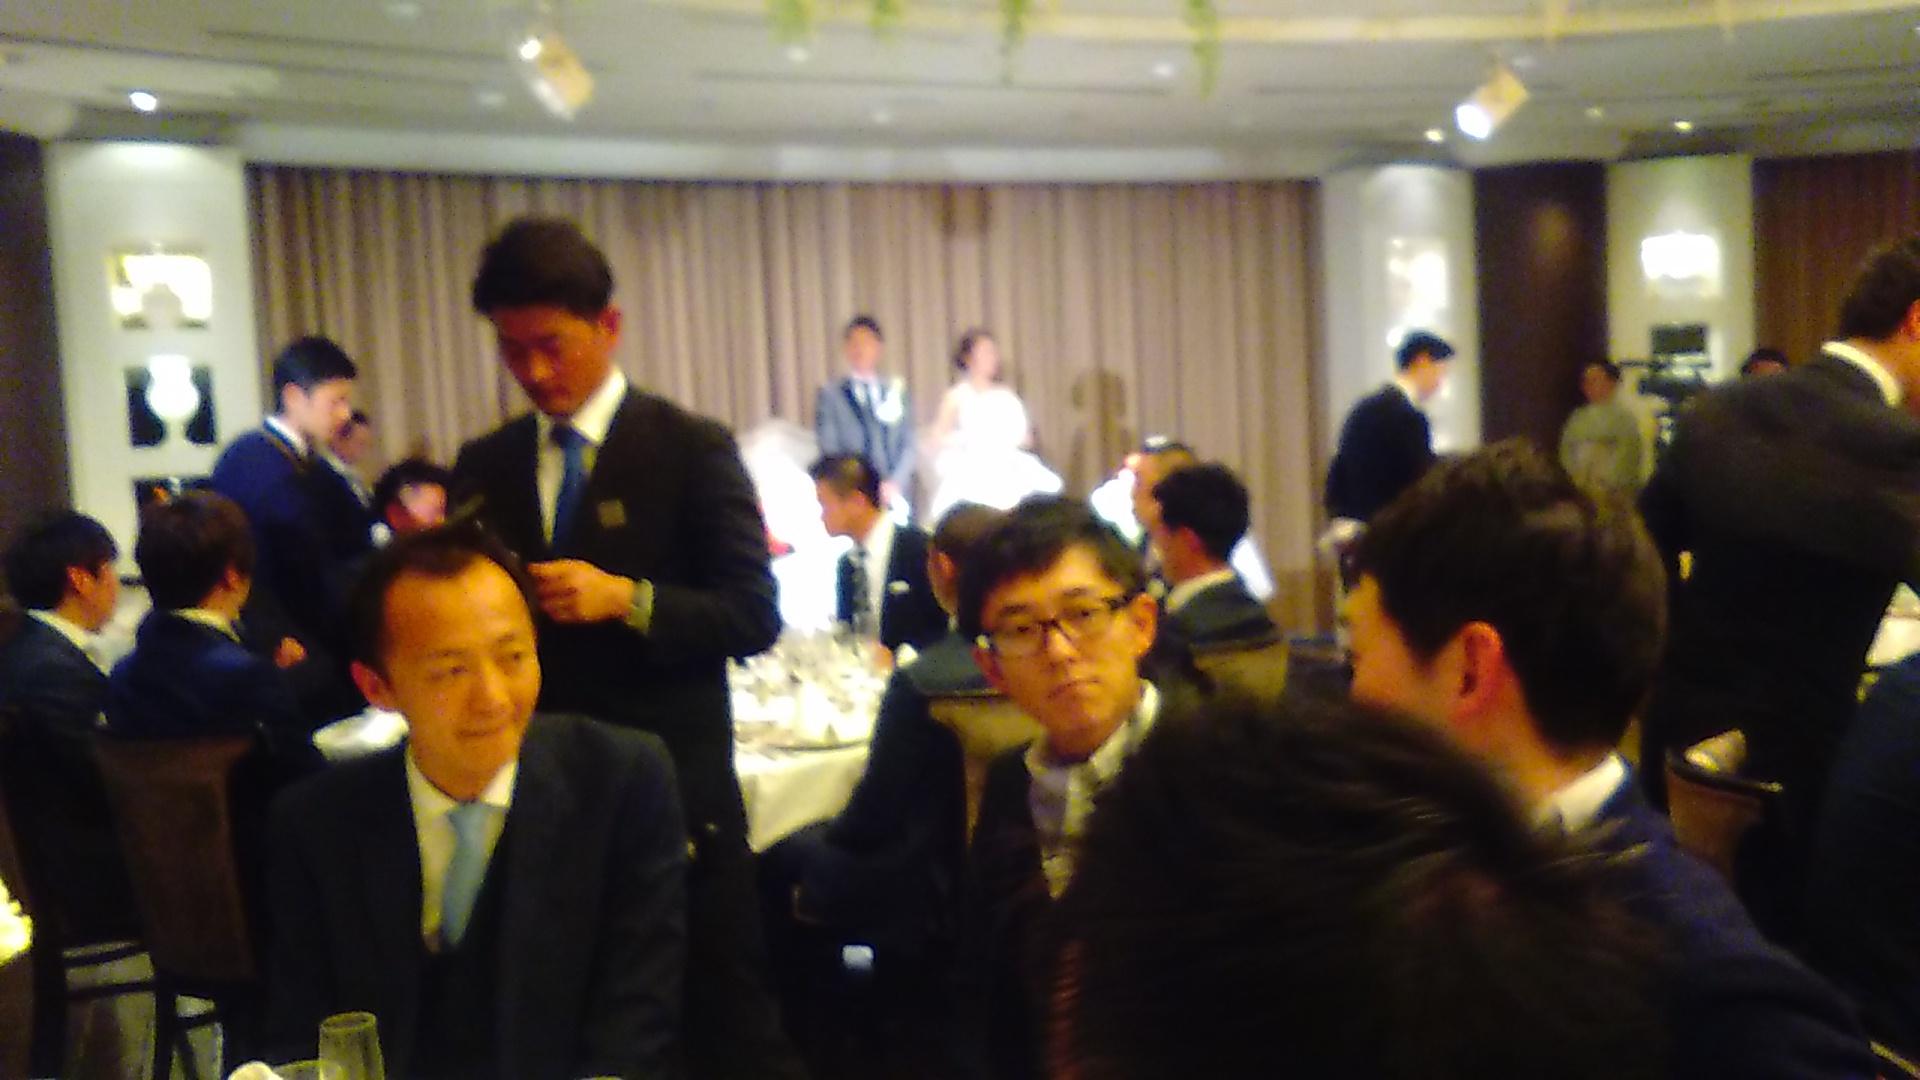 KIMG0665 - 結婚式